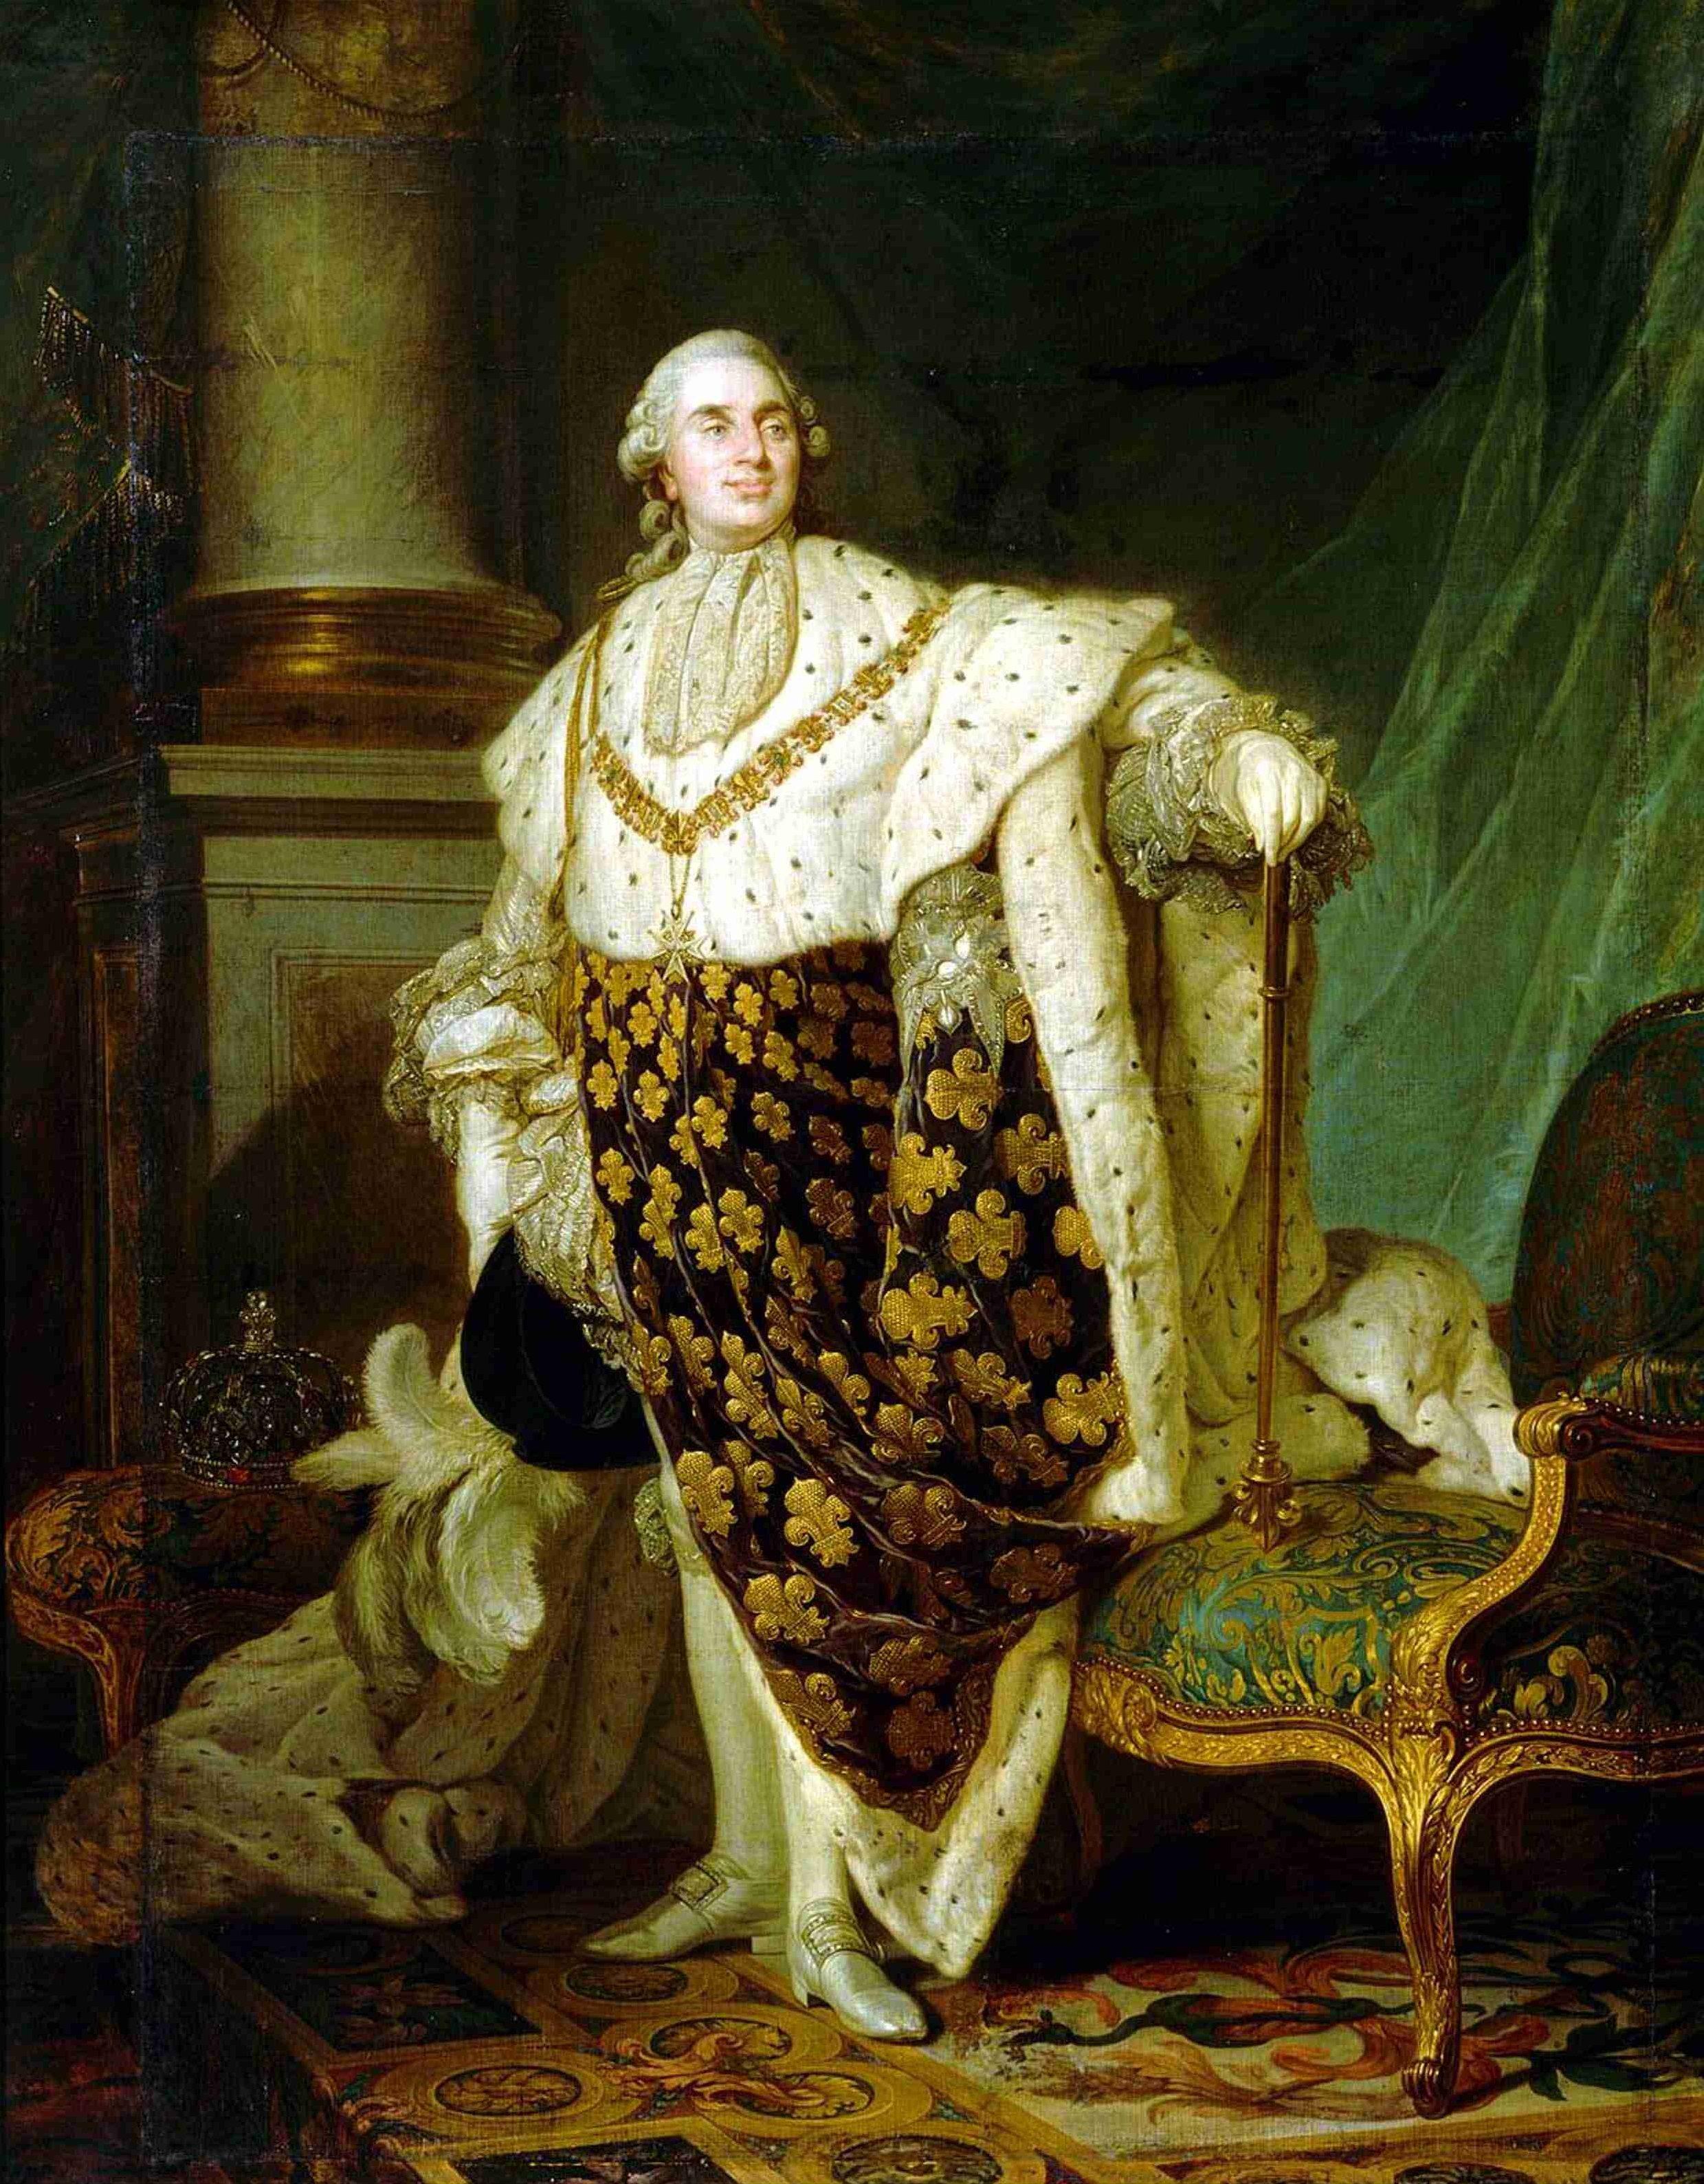 Louis Xvi En Habit De Sacre Jpg 2479 3177 Louis Xvi Luis Xvi De Francia Luis Xv De Francia